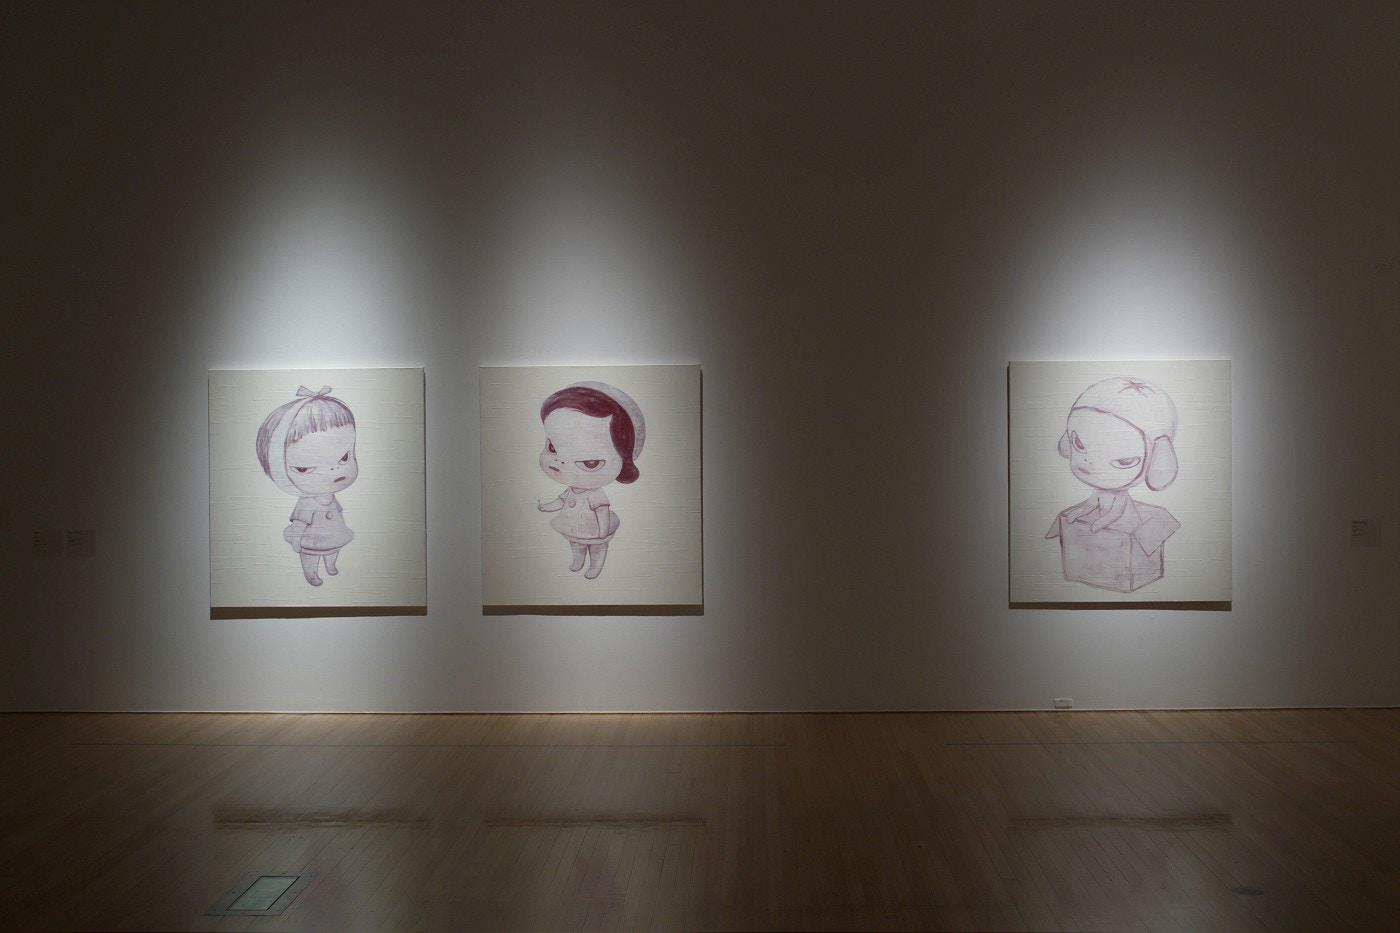 http---hypebeast.com-image-2017-08-yoshitomo-nara-for-better-or-worse-exhibit-japan-inside-look-15